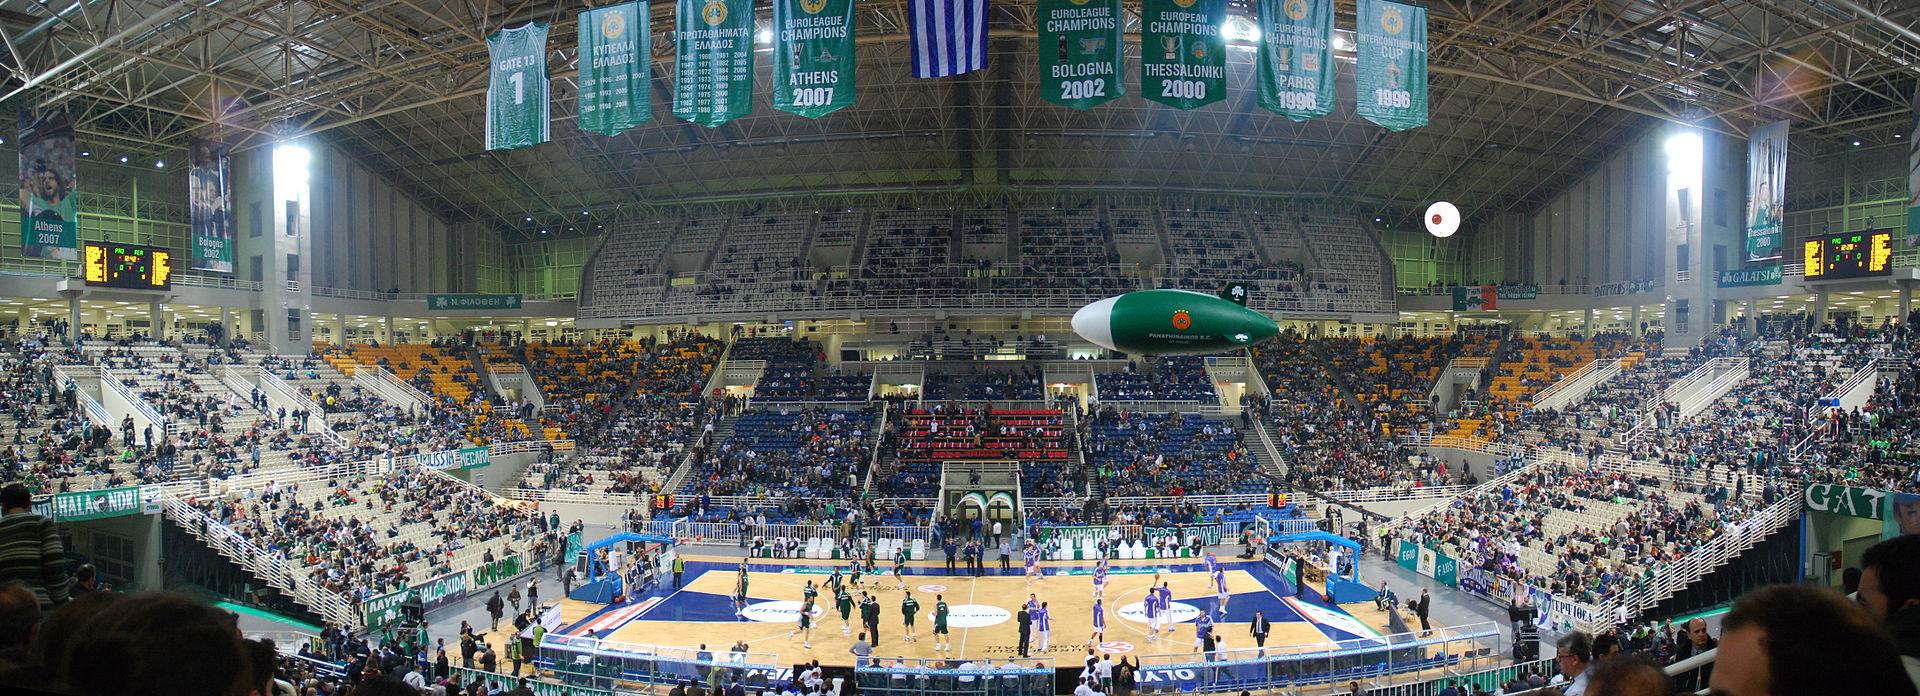 Interior_of_OAKA_Olympic_Indoor_Hall,_Athens.jpg